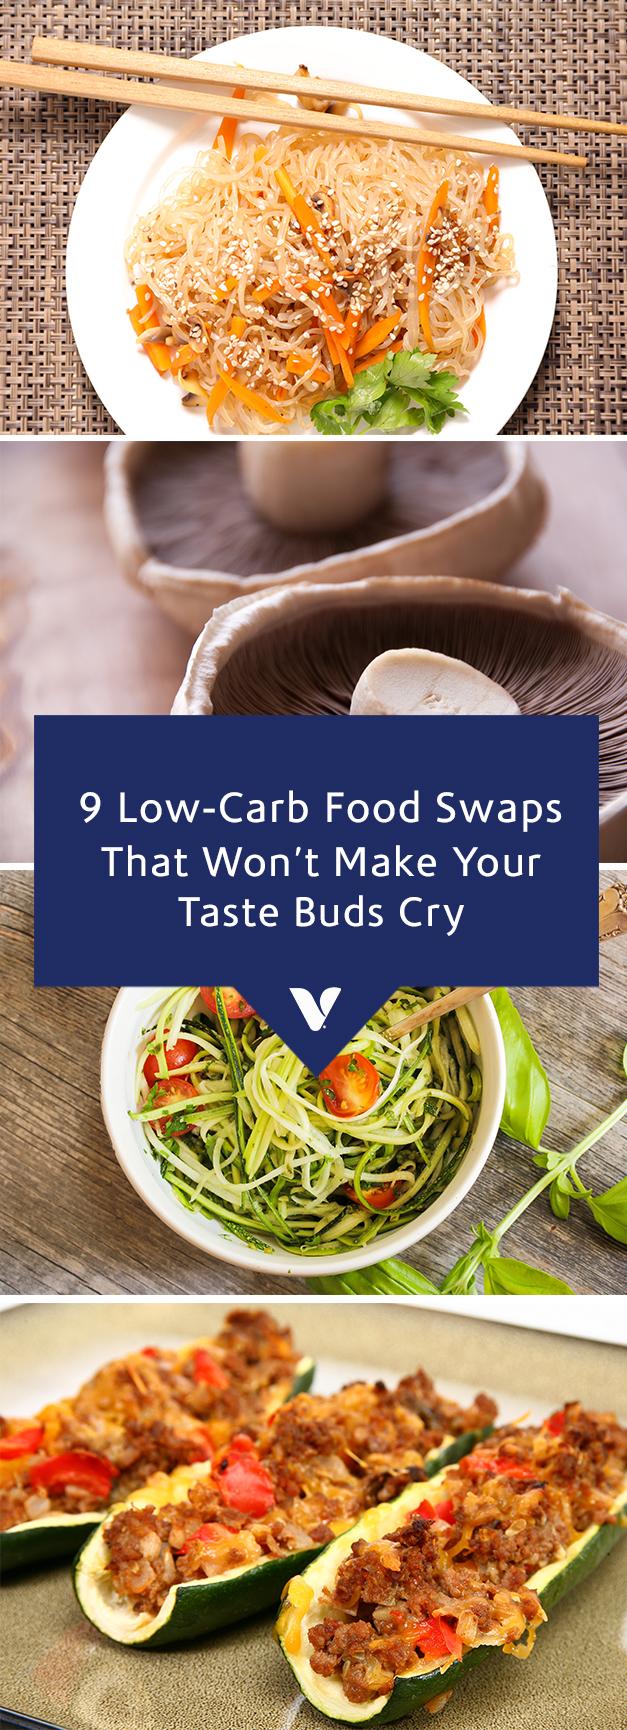 Low Carb Food Swaps.jpg